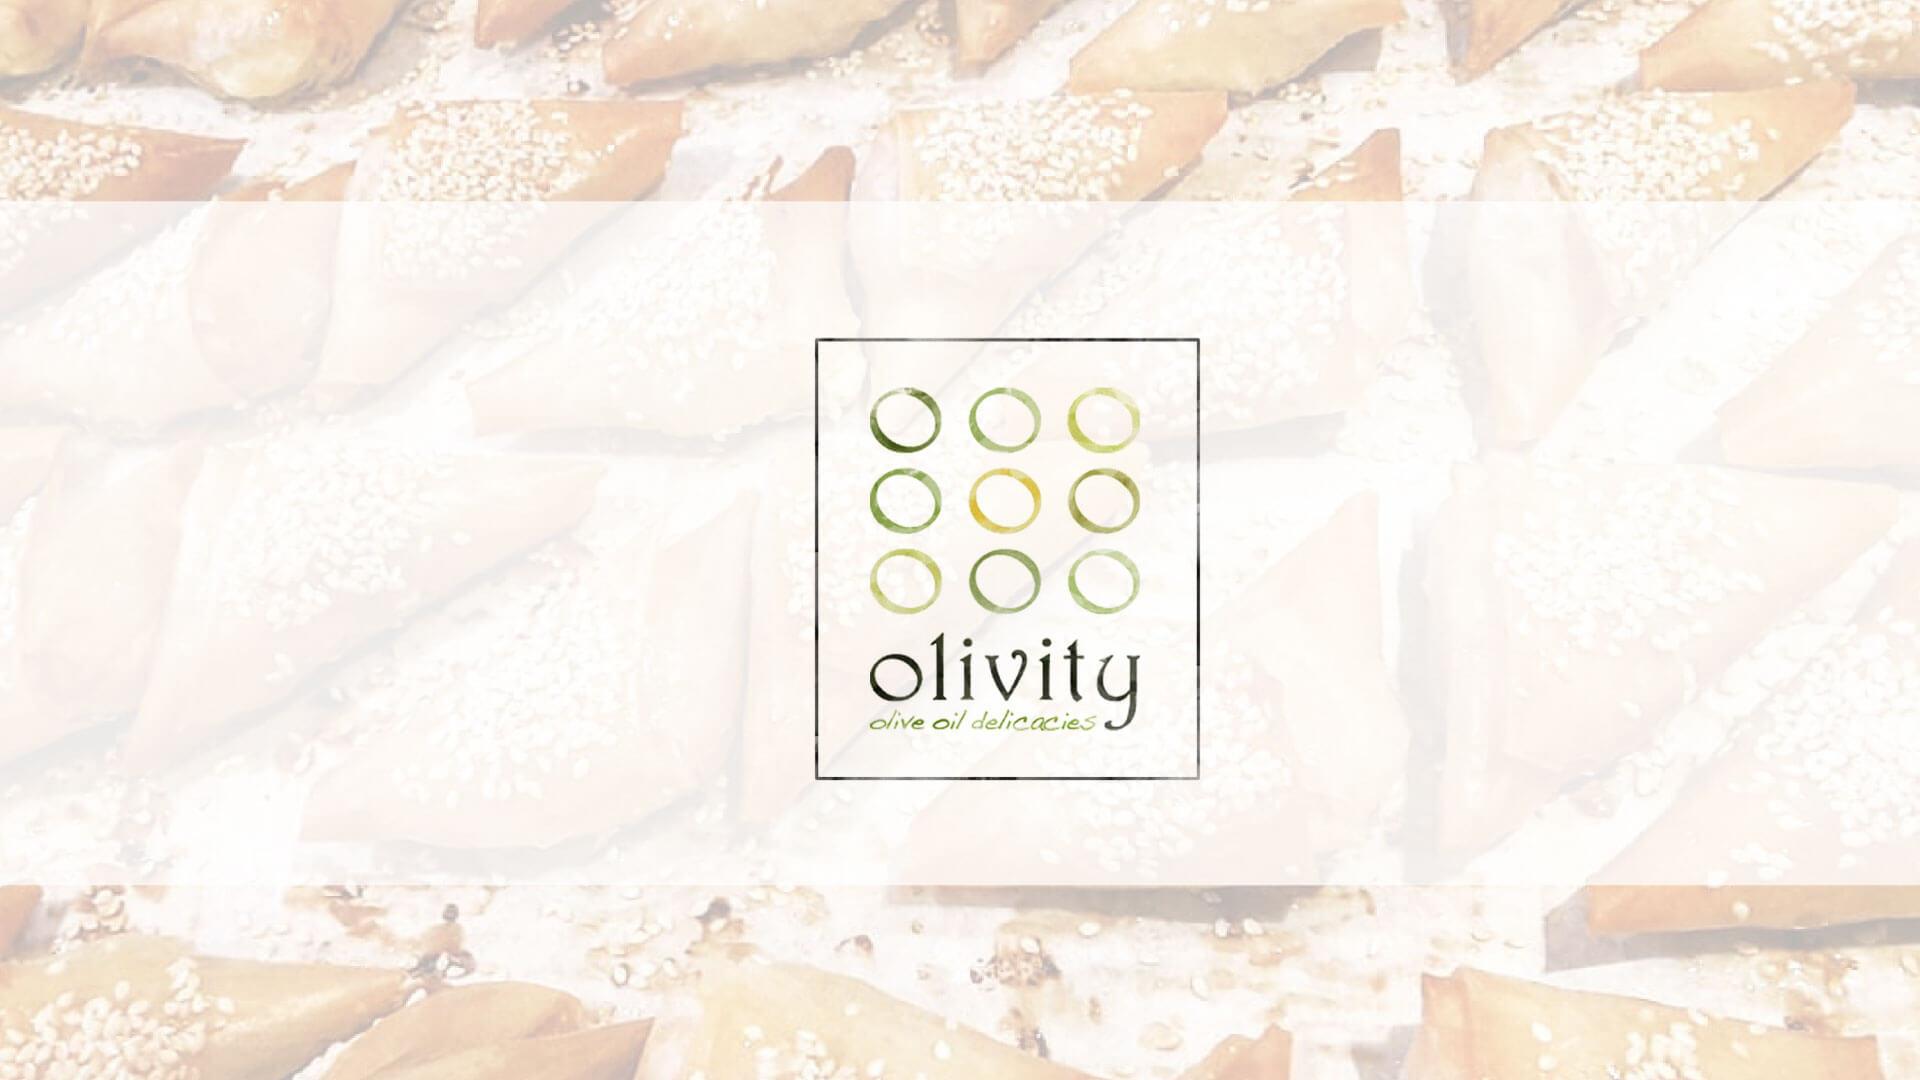 Olivity